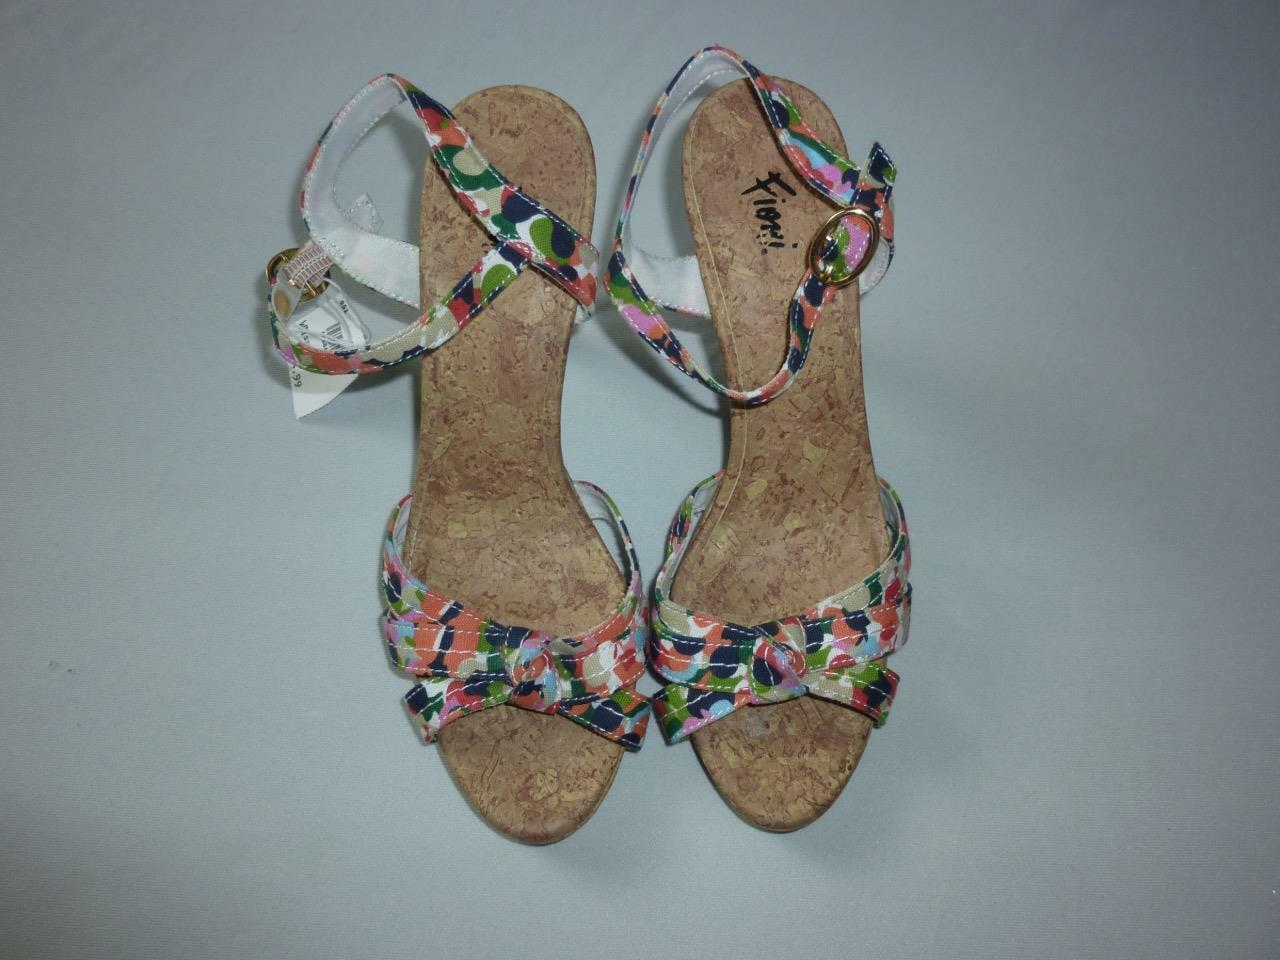 Fioni Women's Stiletto Multi-Color Open Toe Slingback/Strap High Heels Stiletto Women's Sz 6 NWOB 143995